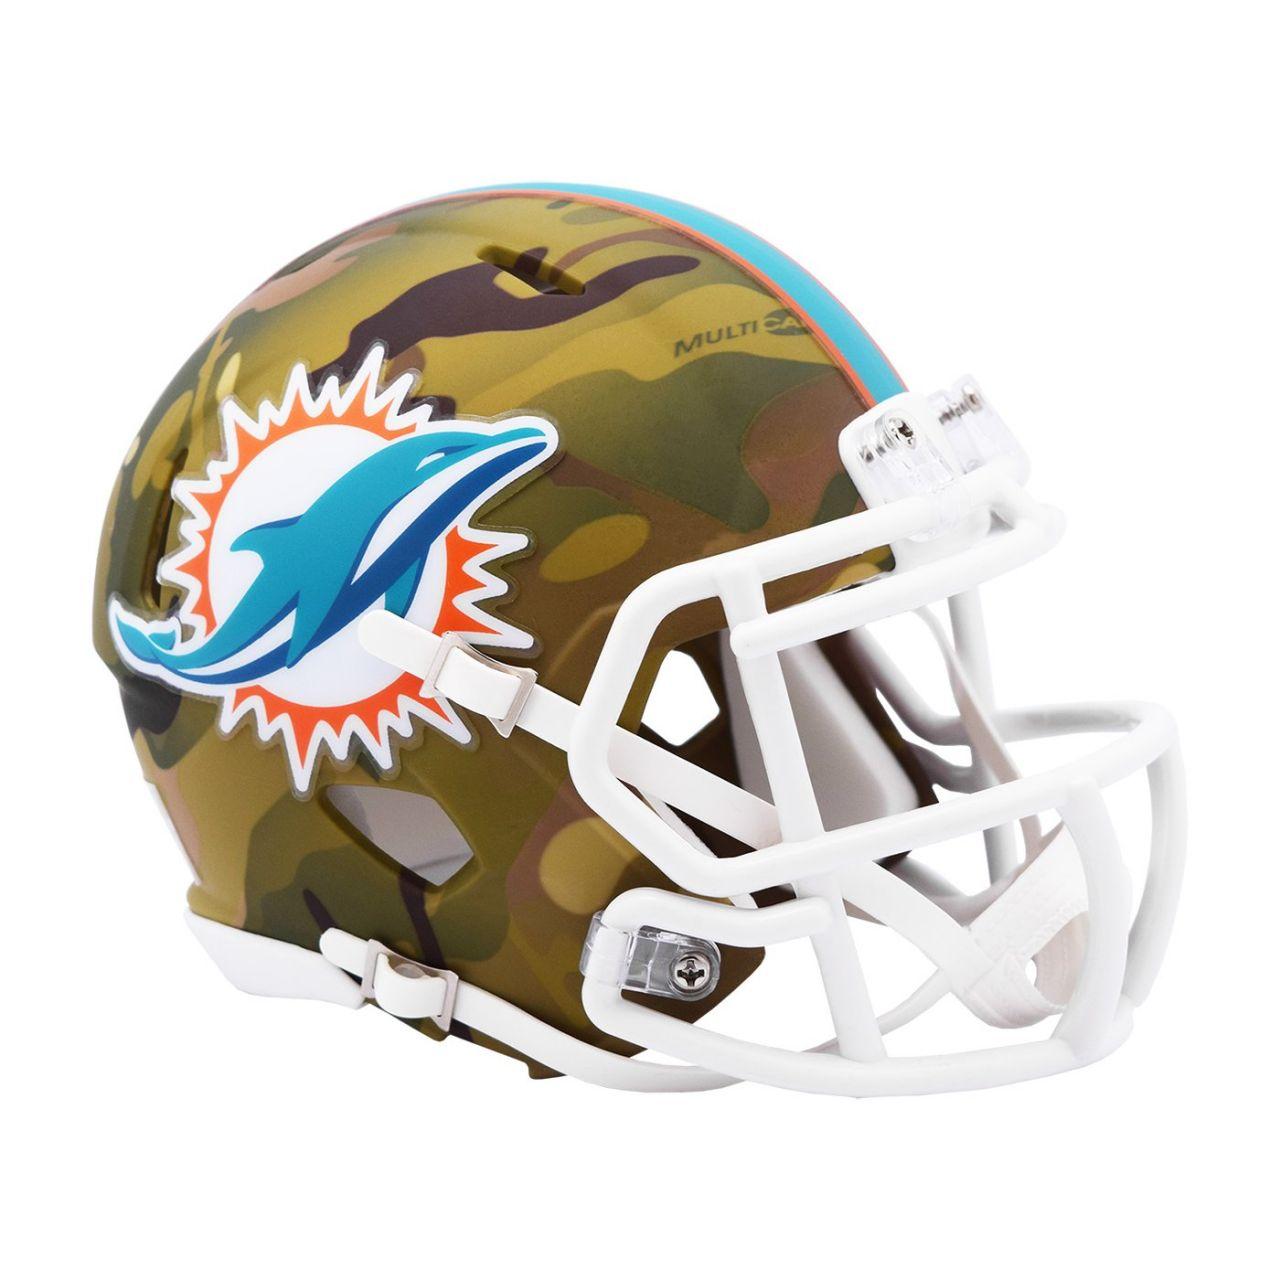 amfoo - Riddell Mini Football NFL Helm MULTICAM Miami Dolphins